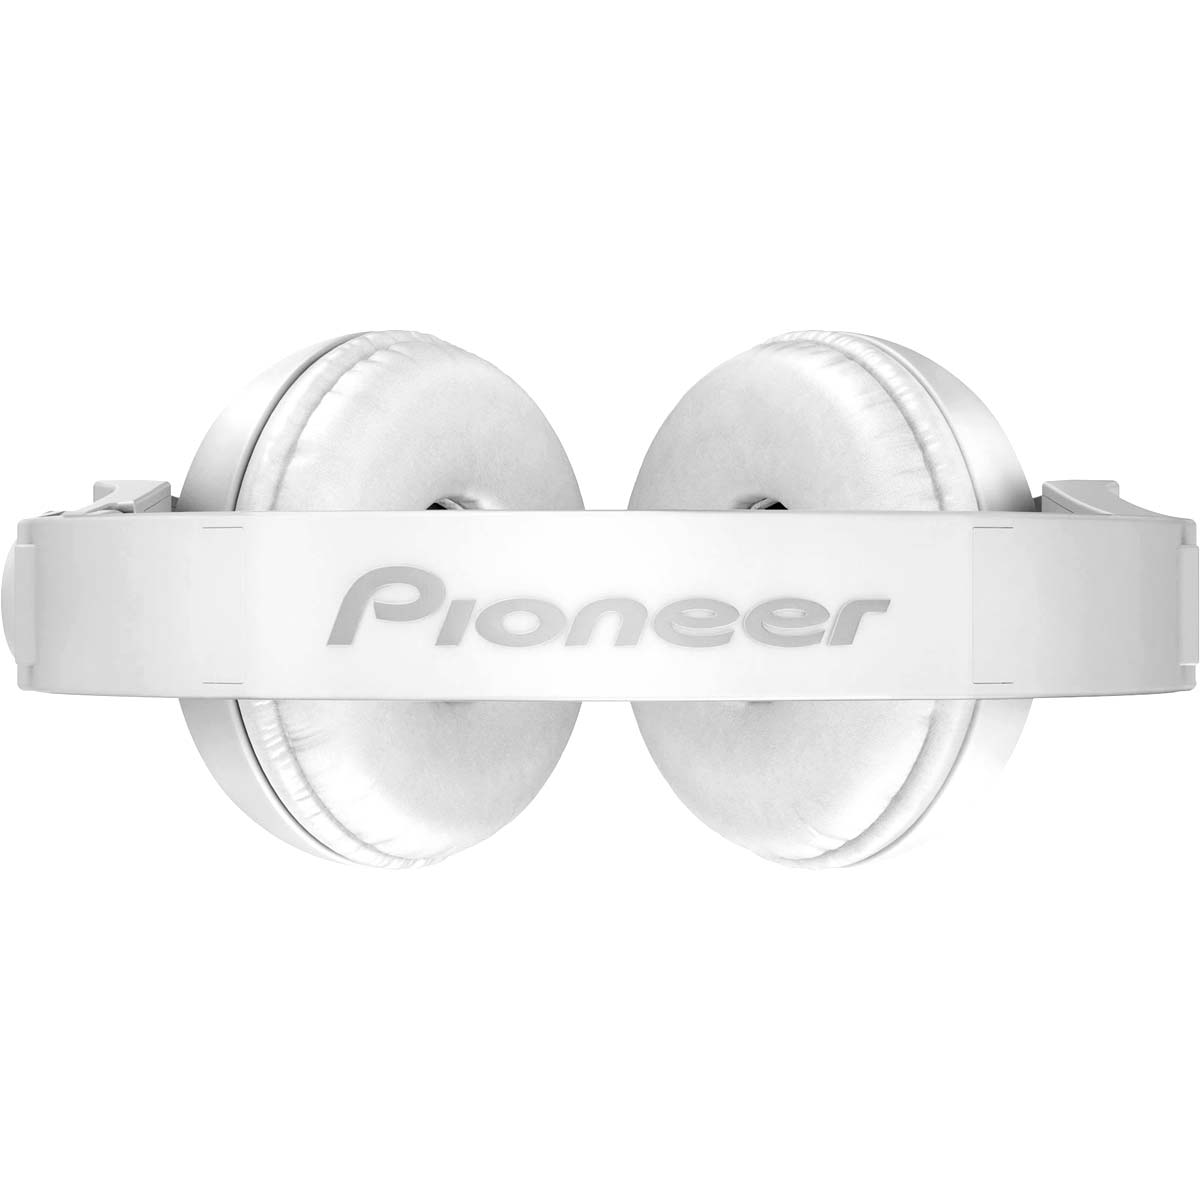 HDJ500 - Fone de Ouvido Over-ear Branco HDJ 500 - Pioneer